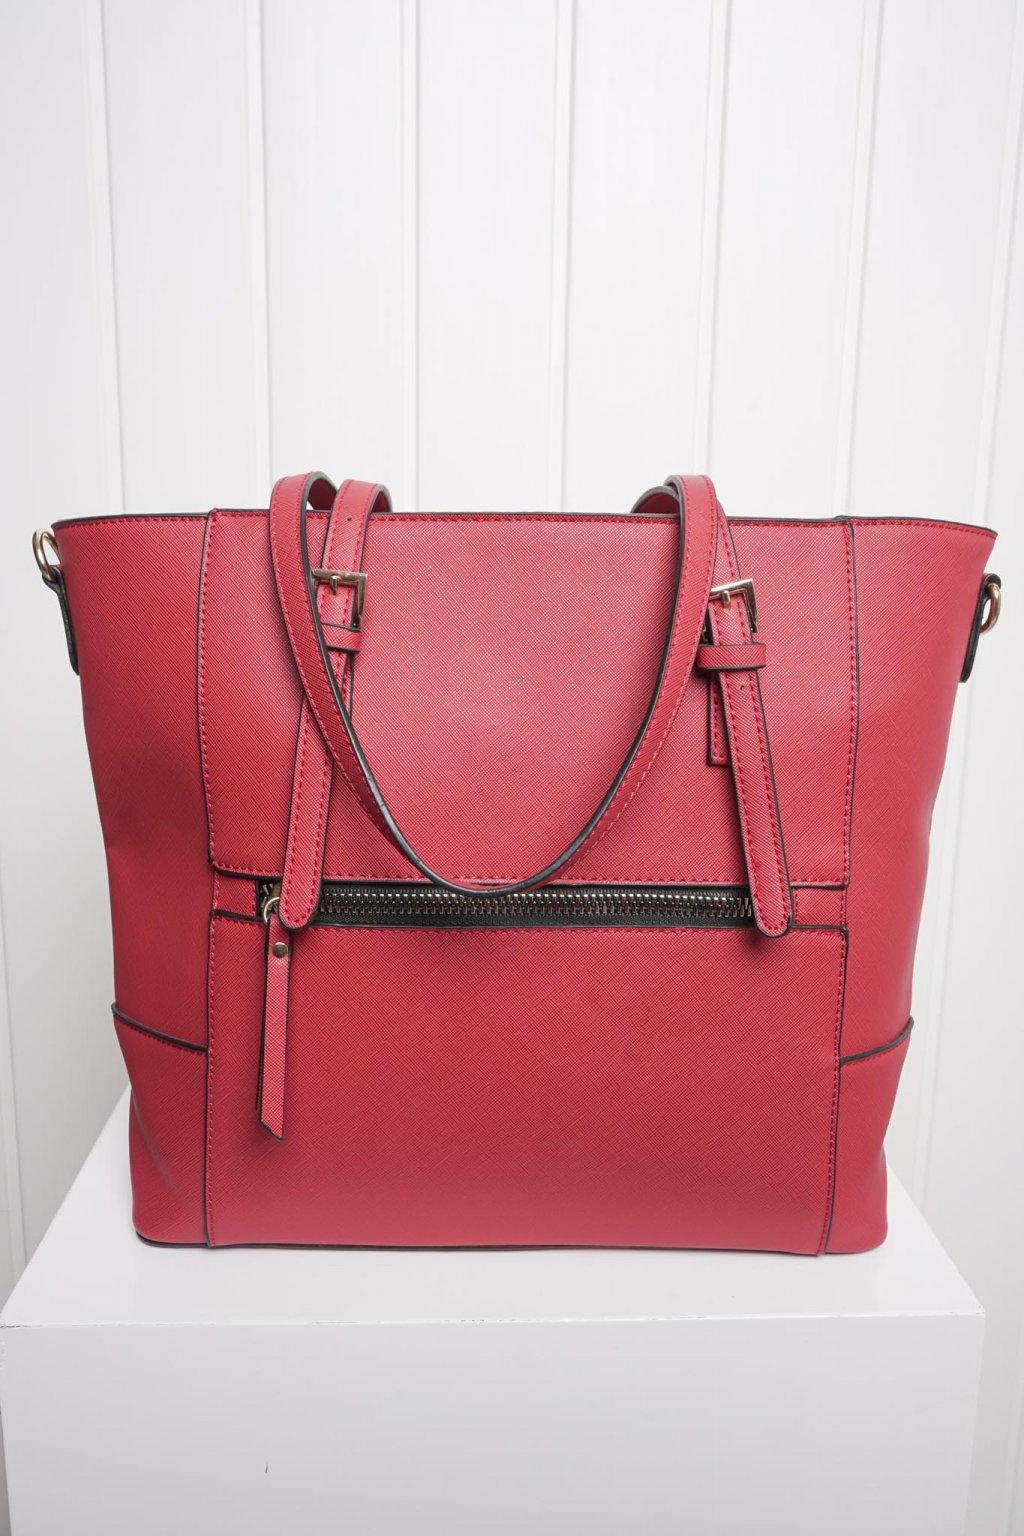 Kabelka, ruksak, dobrá cena, čierna kabelka, čierny ruksak, basic, kabelky, ruksaky 054